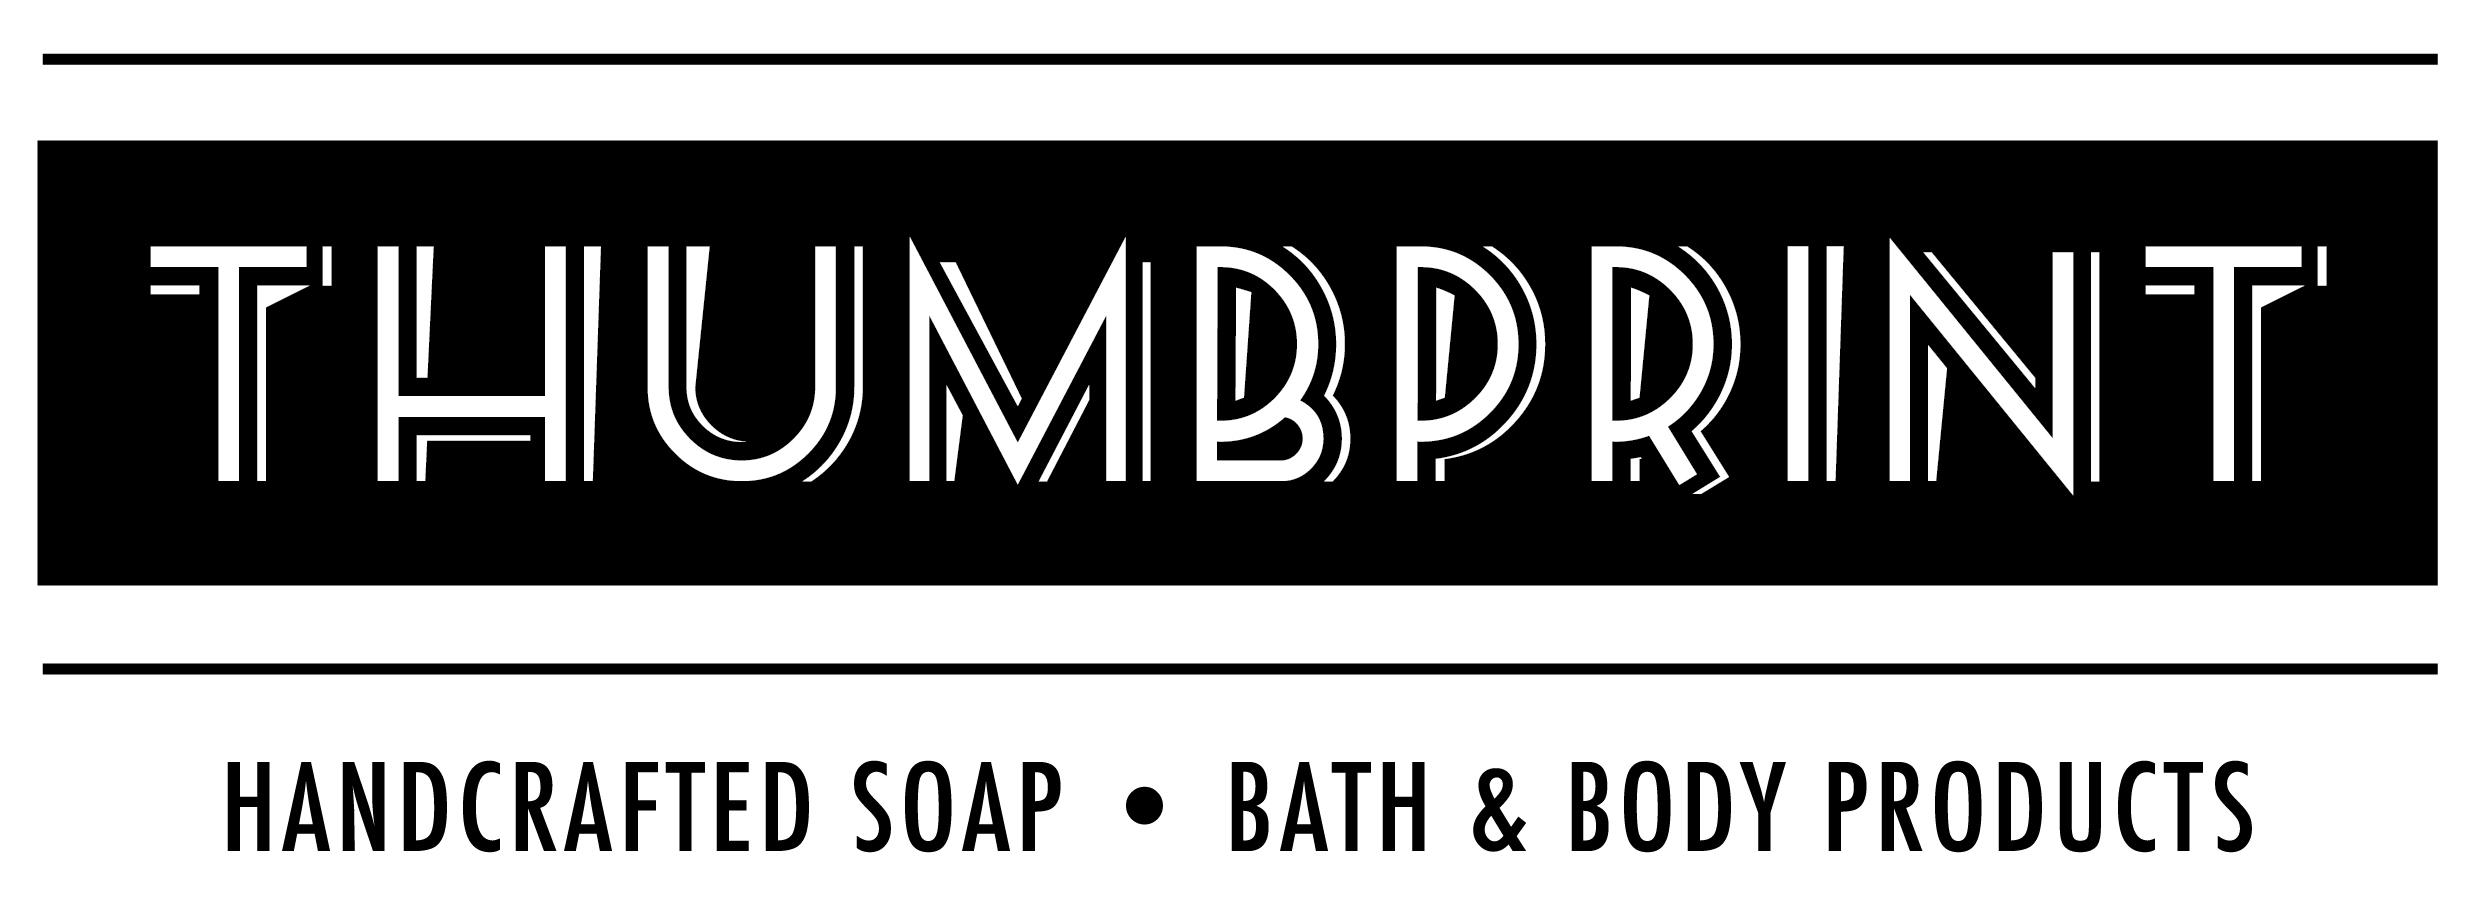 thumbprint-logo-hires-01.jpg